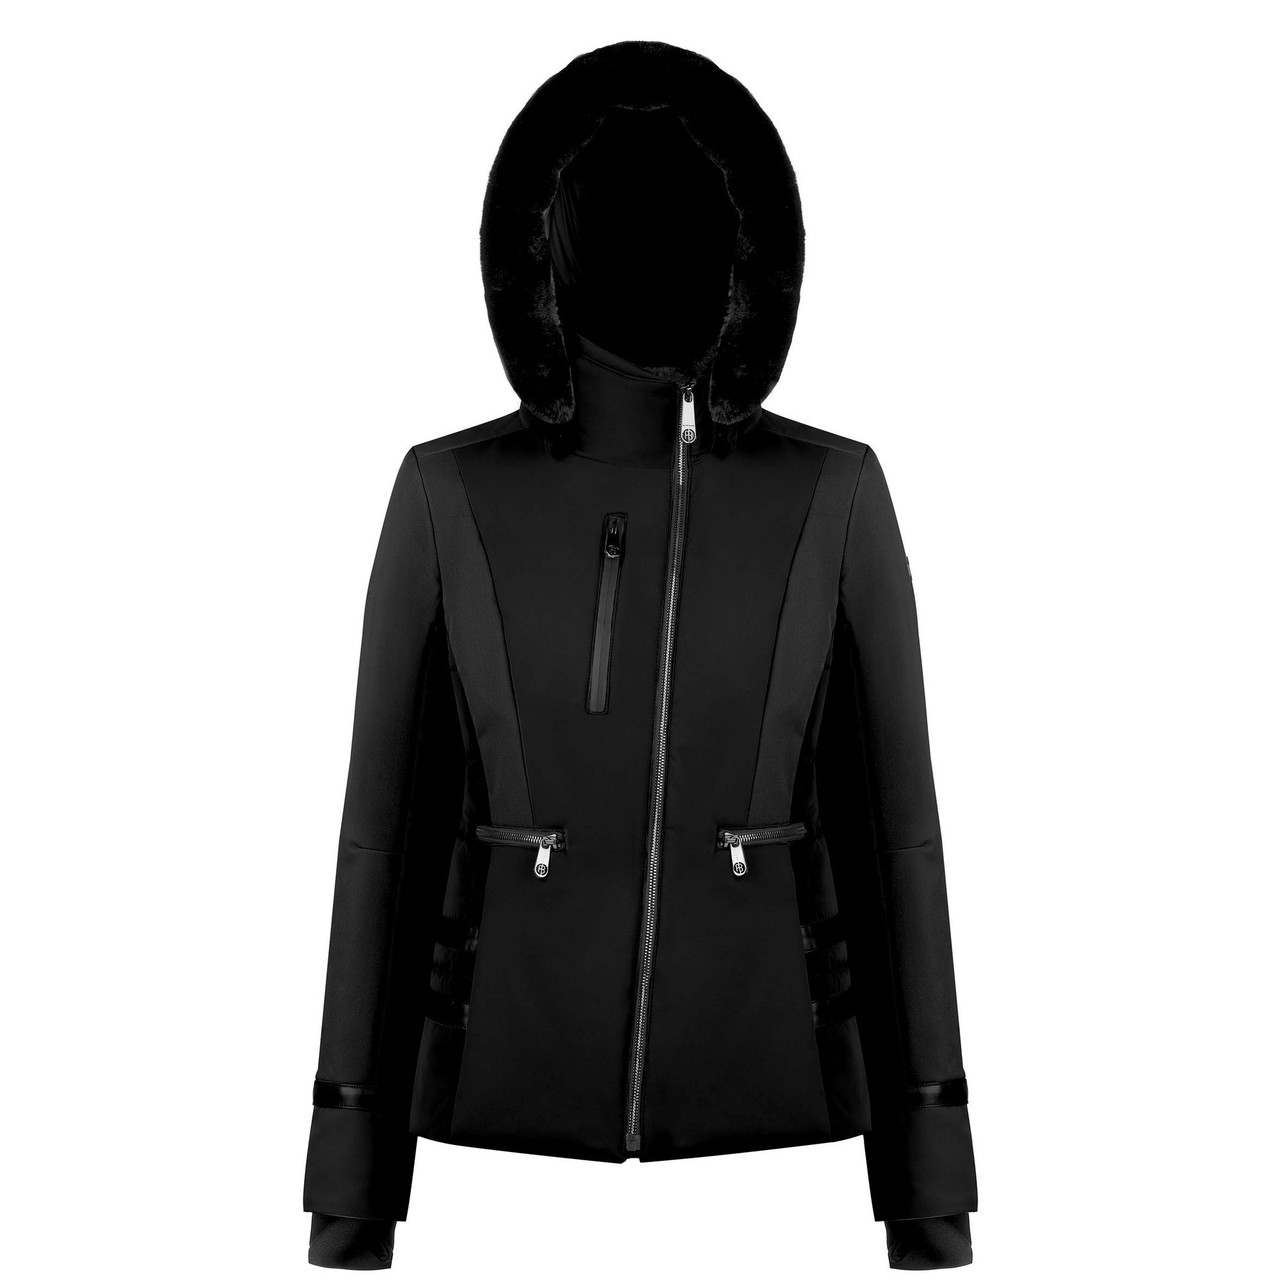 Горнолыжная куртка Poivre Blanc  Stretch ski jaket  with satin effect Black р. S